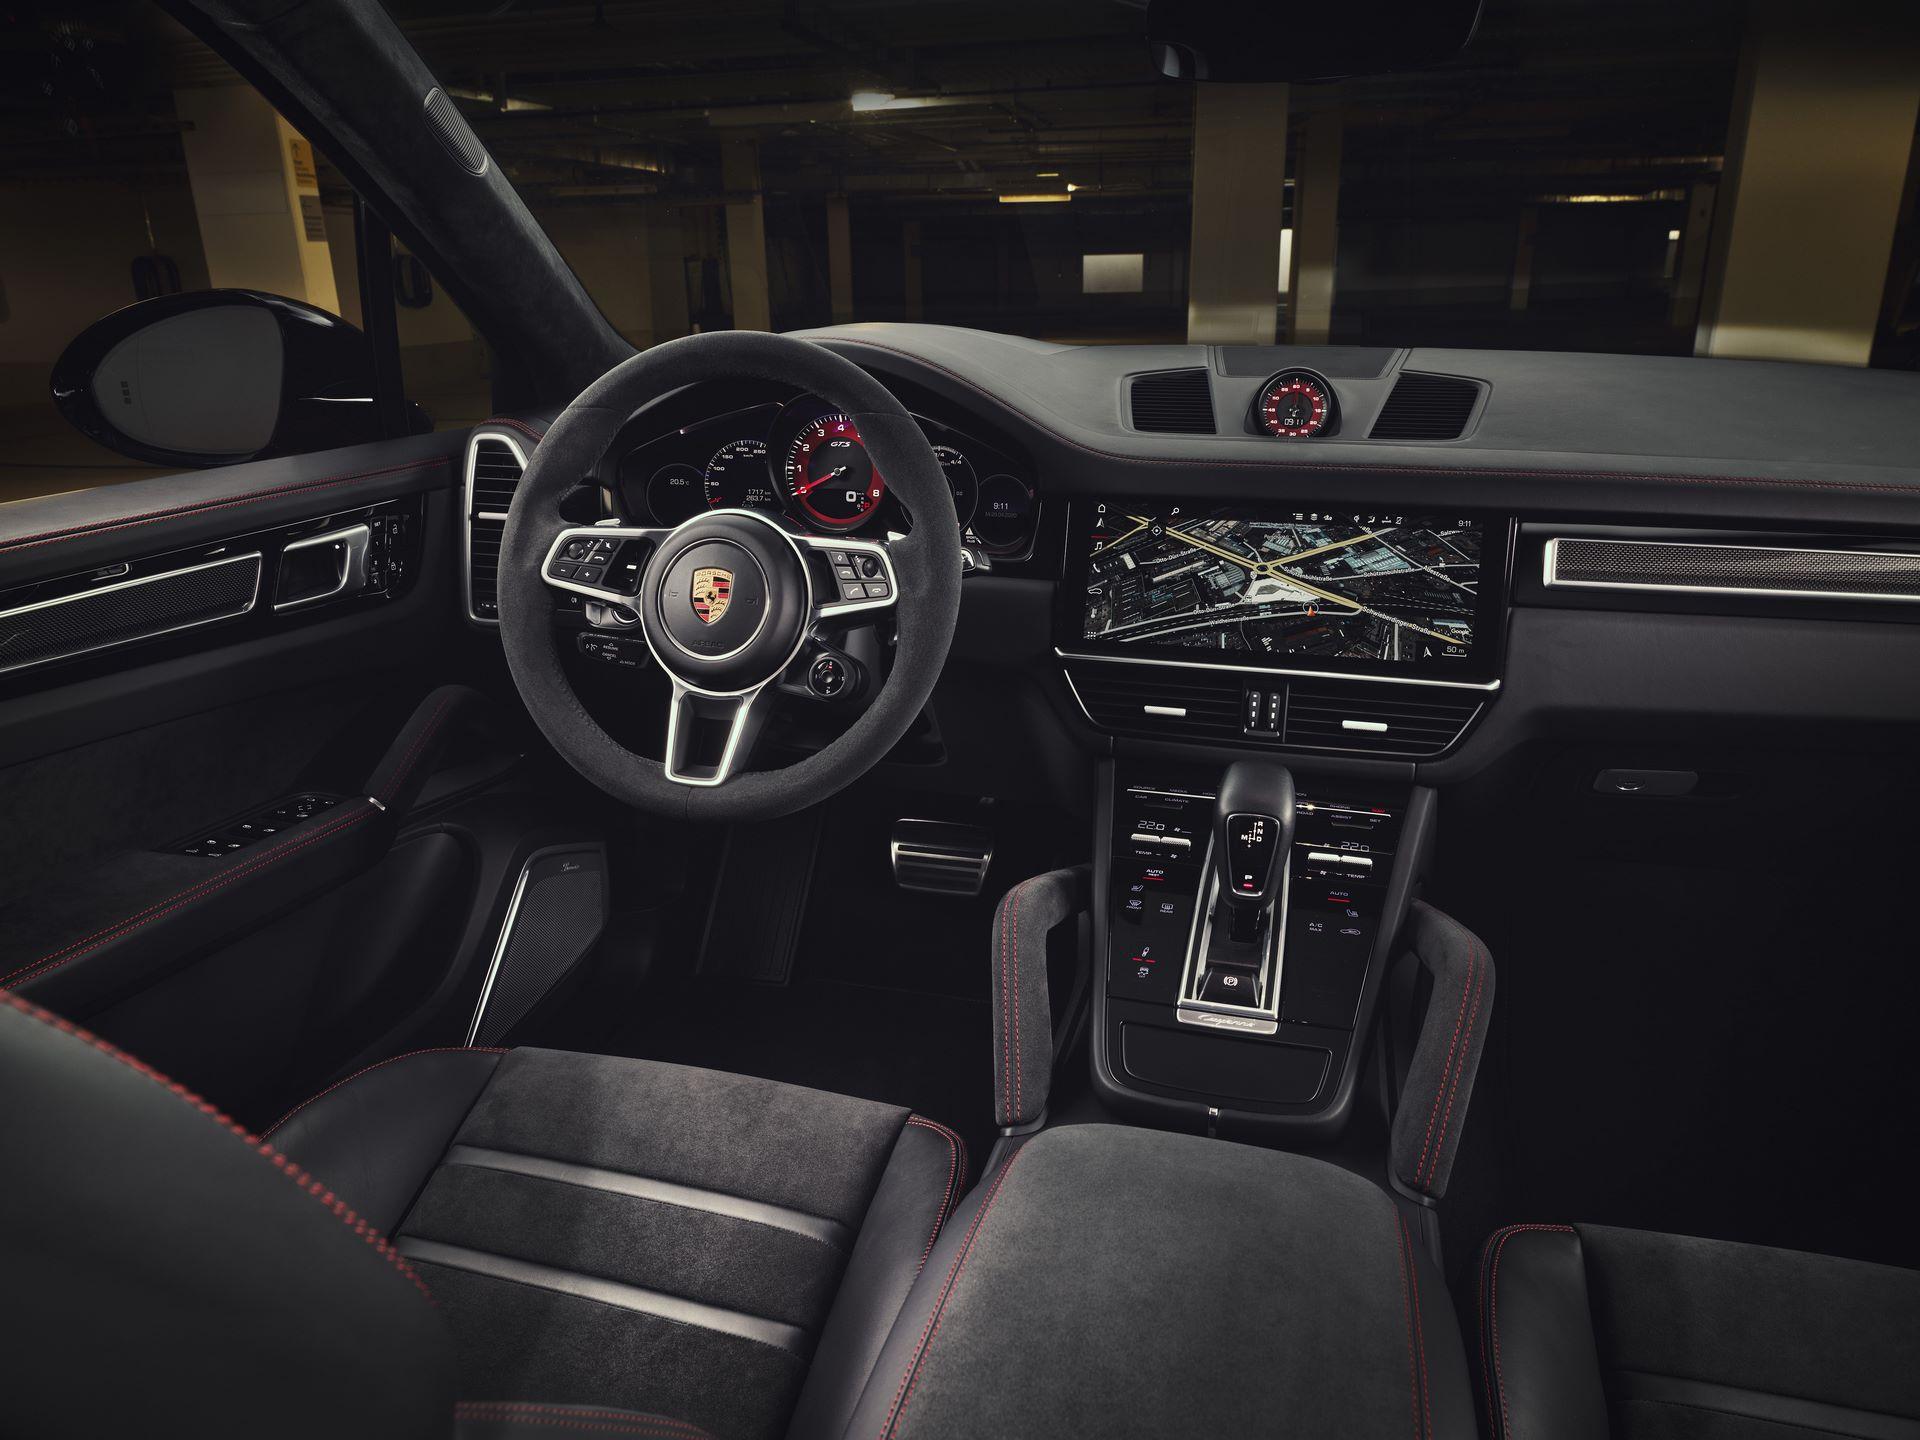 Porsche-Cayenne-GTS-and-Cayenne-GTS-Coupe-2021-21